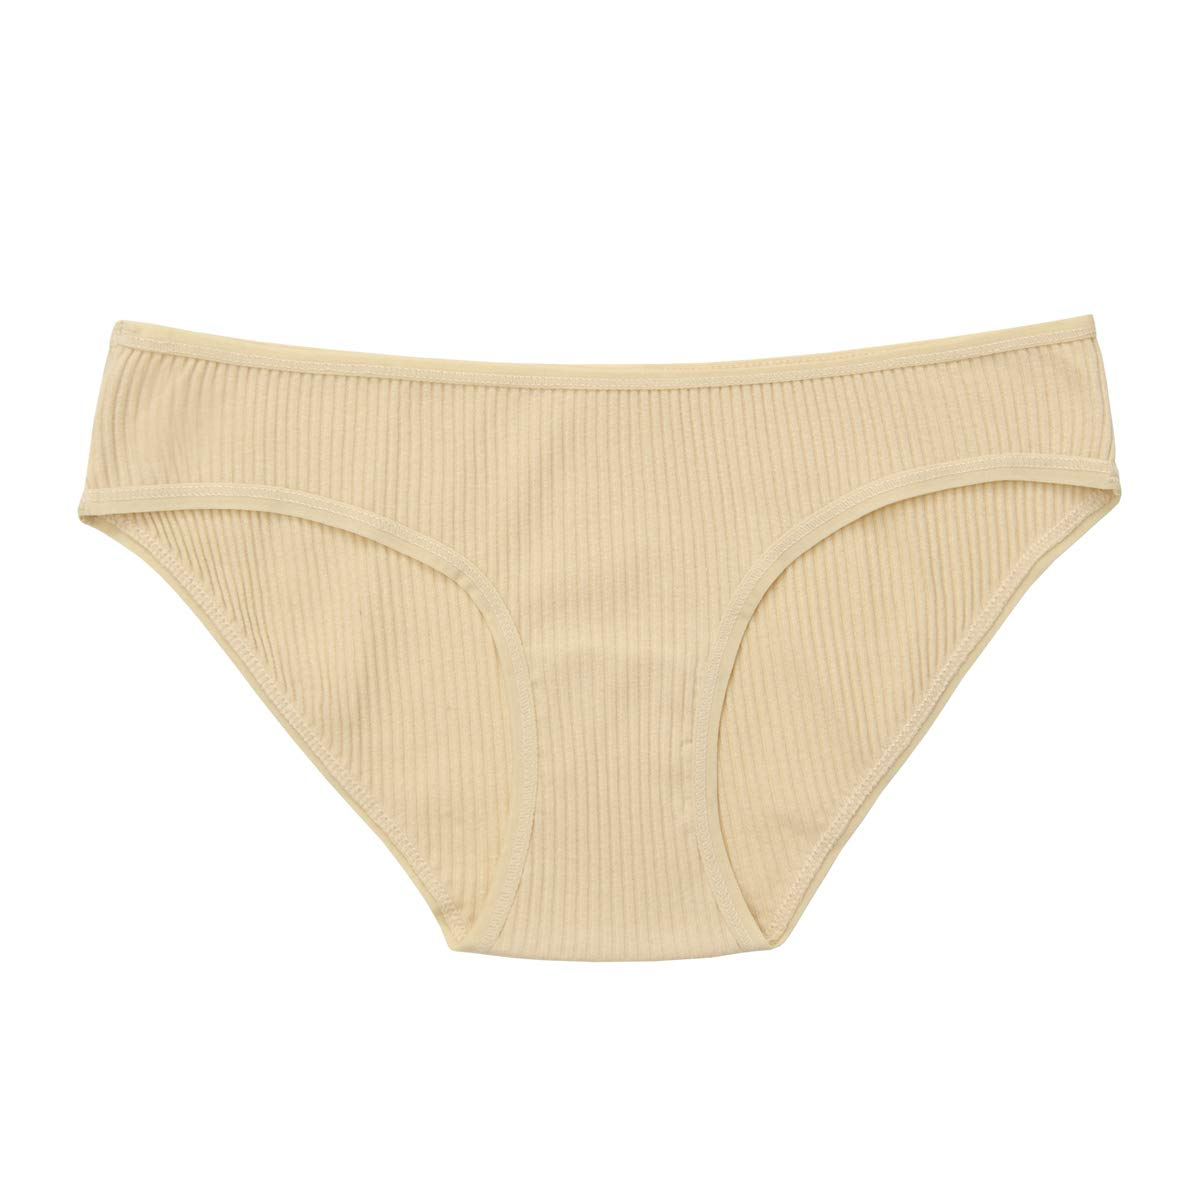 42f32d1940c Knitlord Women's Thick Cotton Stretch Bikini Panties Comfort Rib Underwear  6 Pack at Amazon Women's Clothing store: